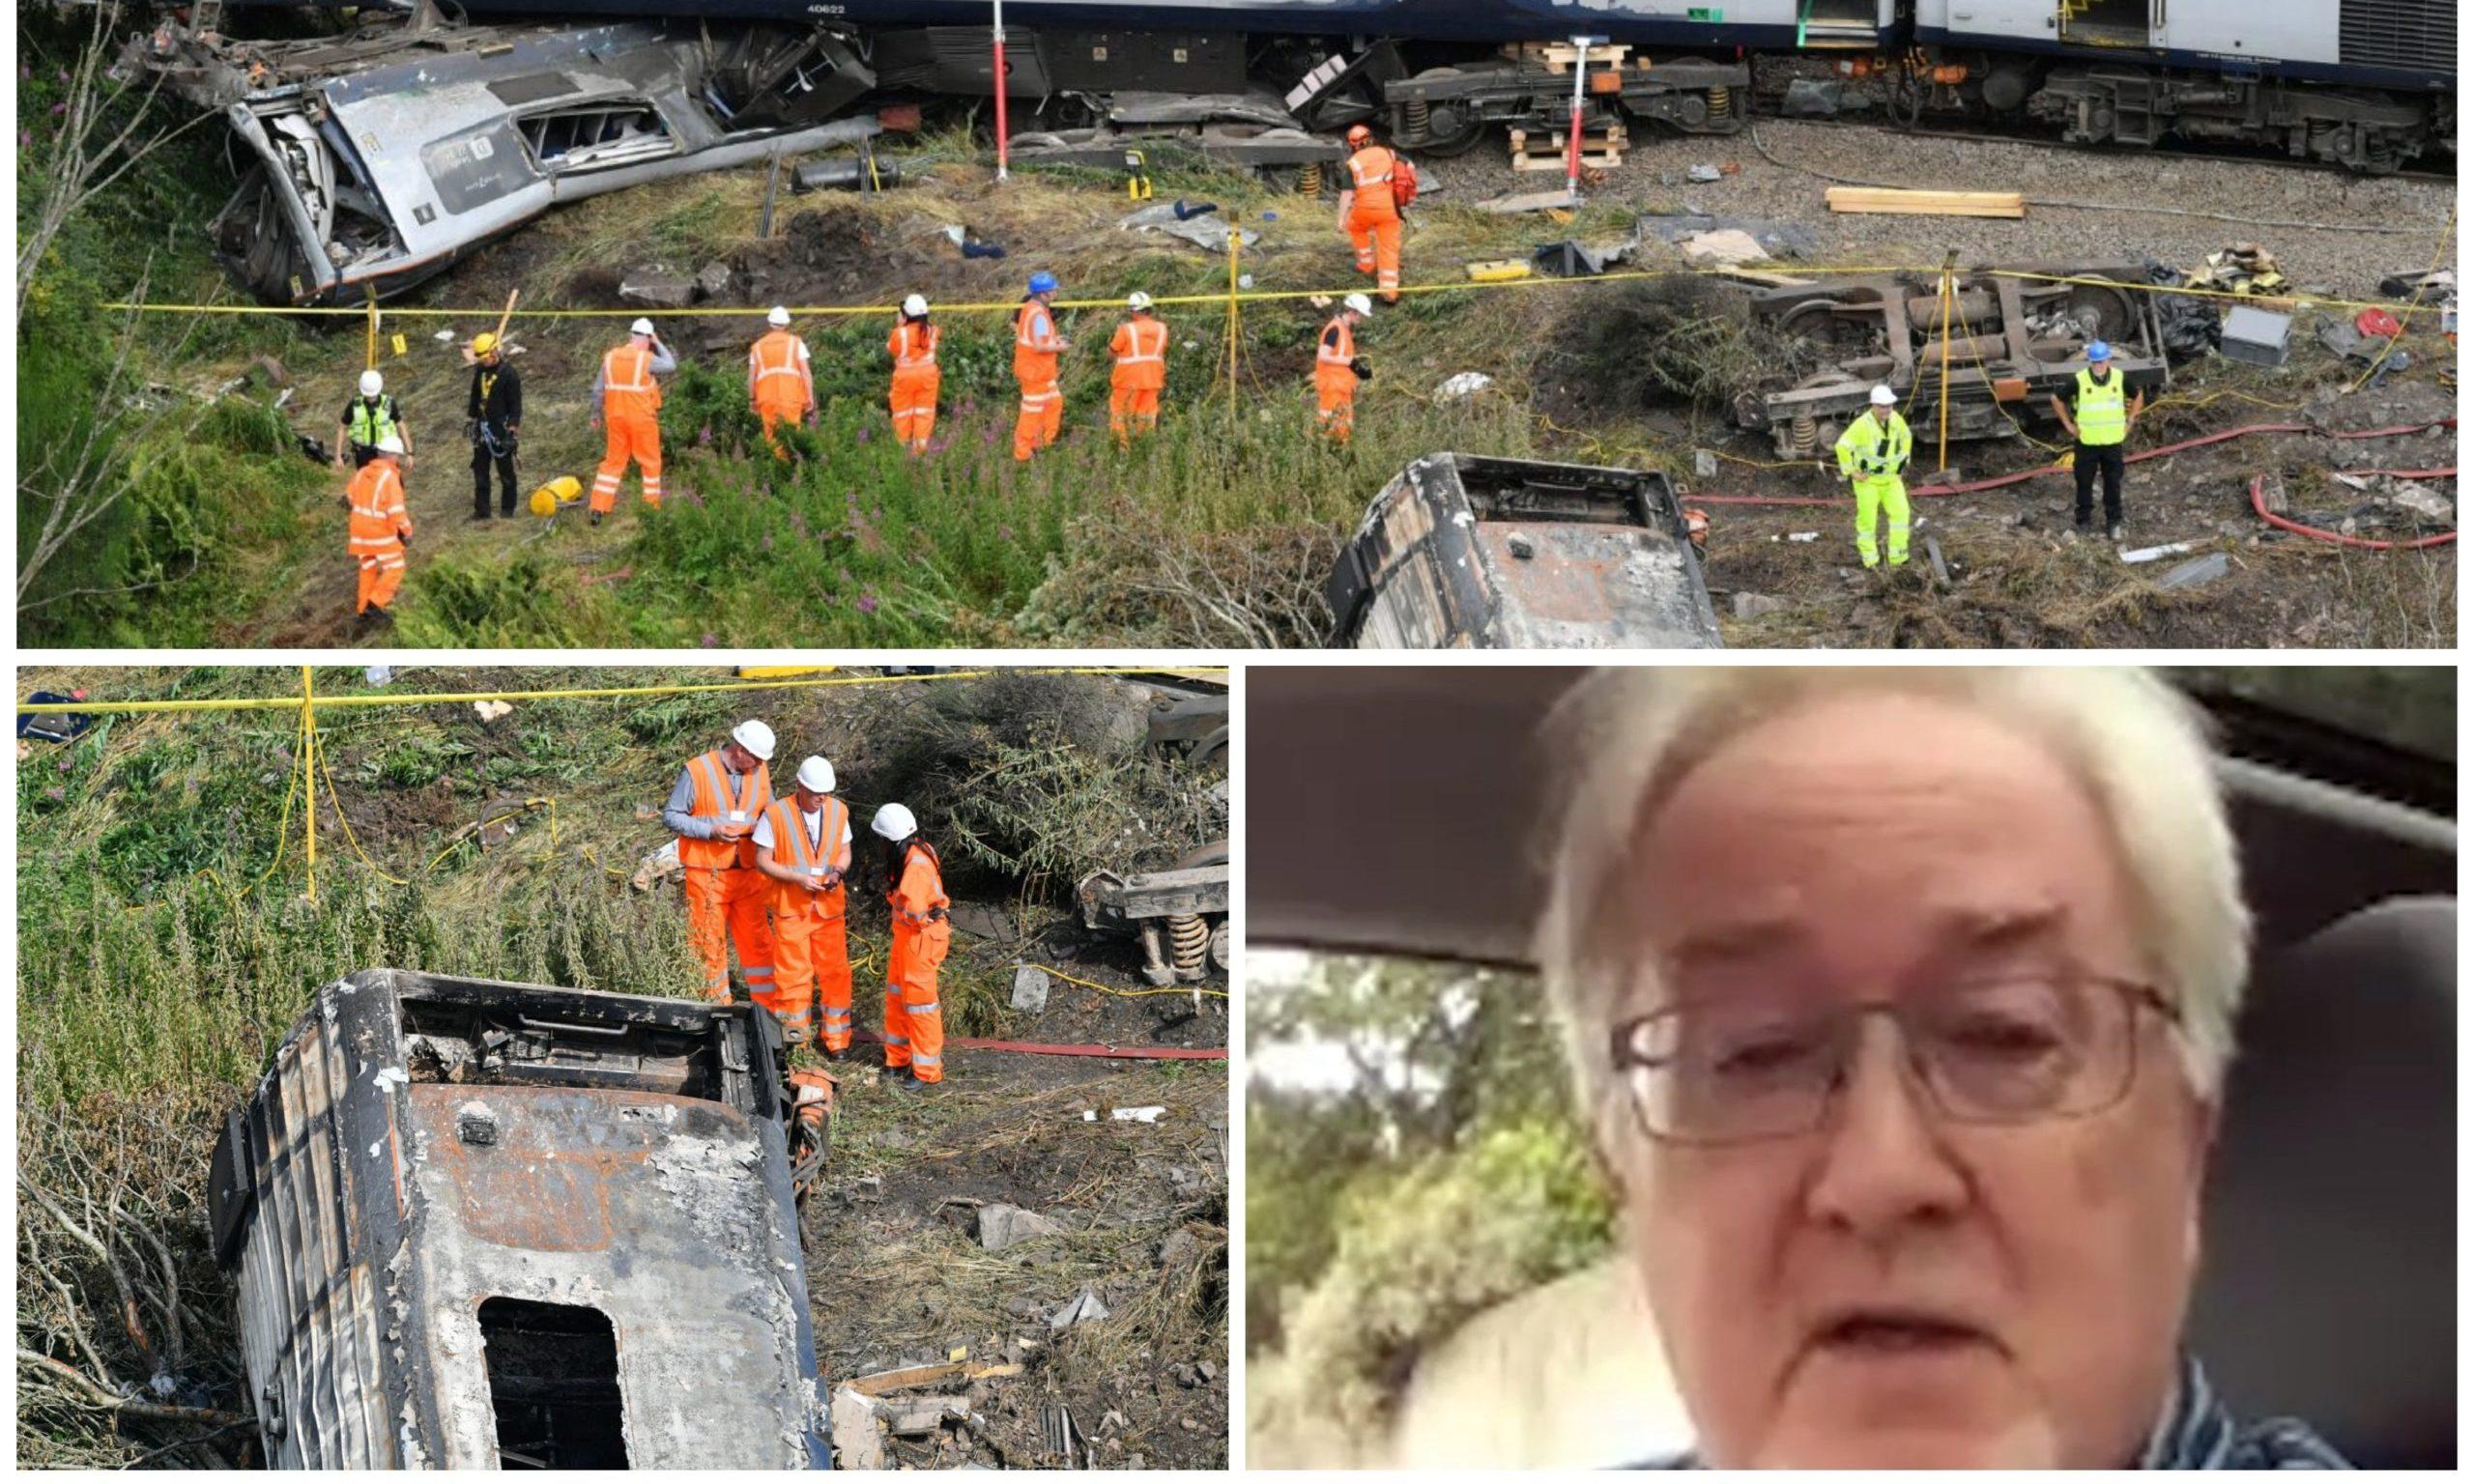 Railway Magazine editor Chris Milner, bottom right, speaking about the tragic train derailment near Stonehaven.